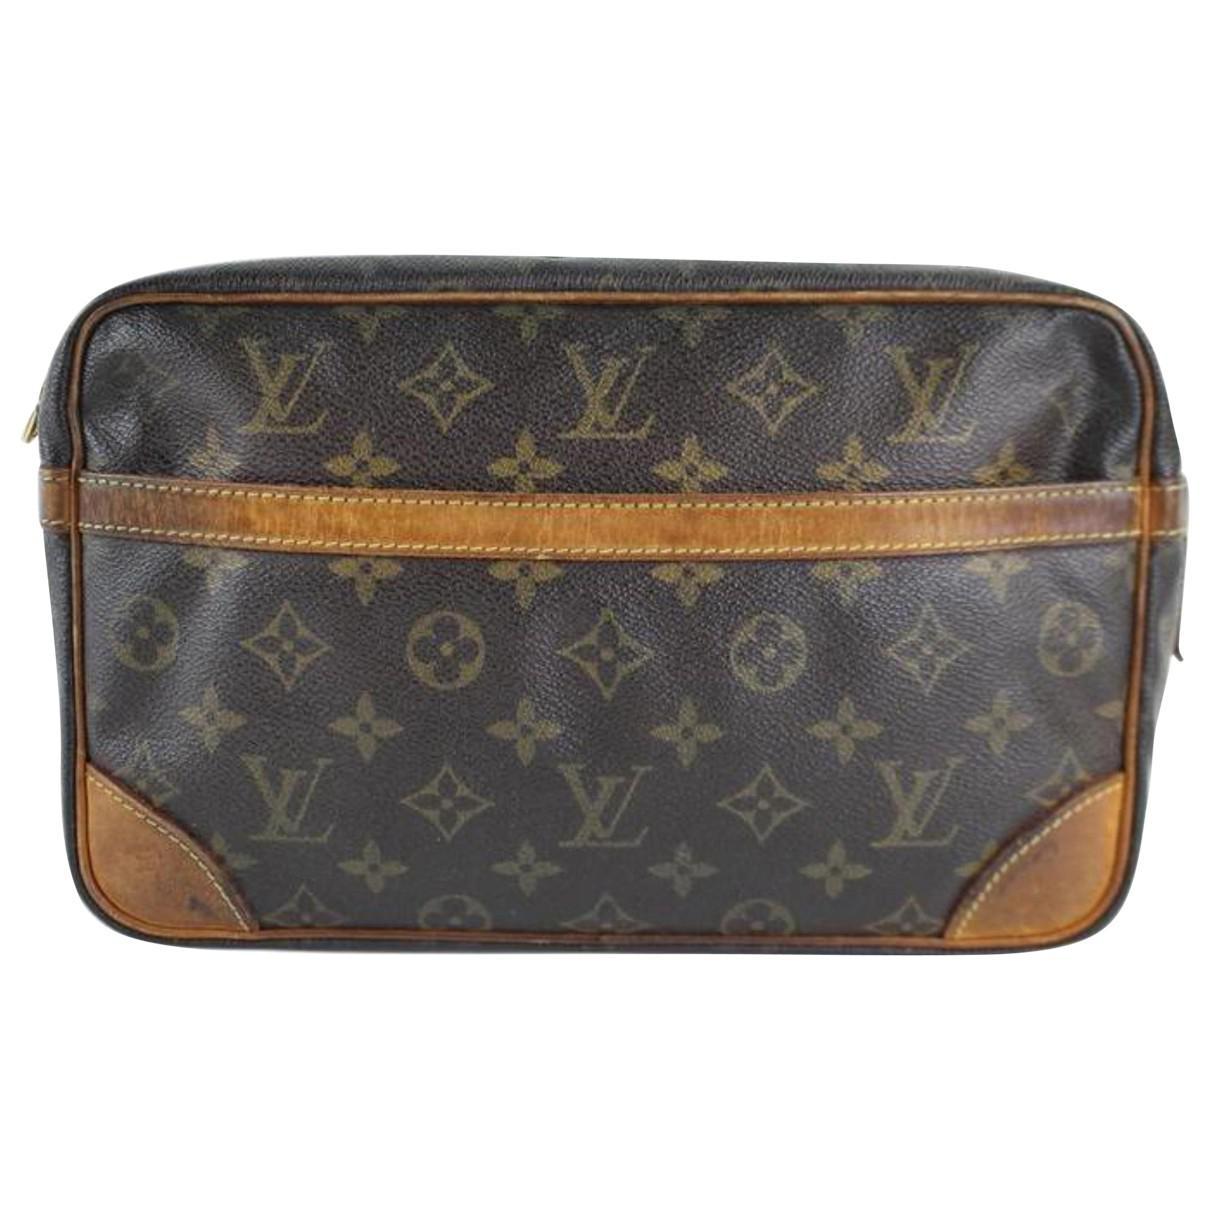 Louis Vuitton Pre-owned - CLUTCH HANDBAG XqzEw